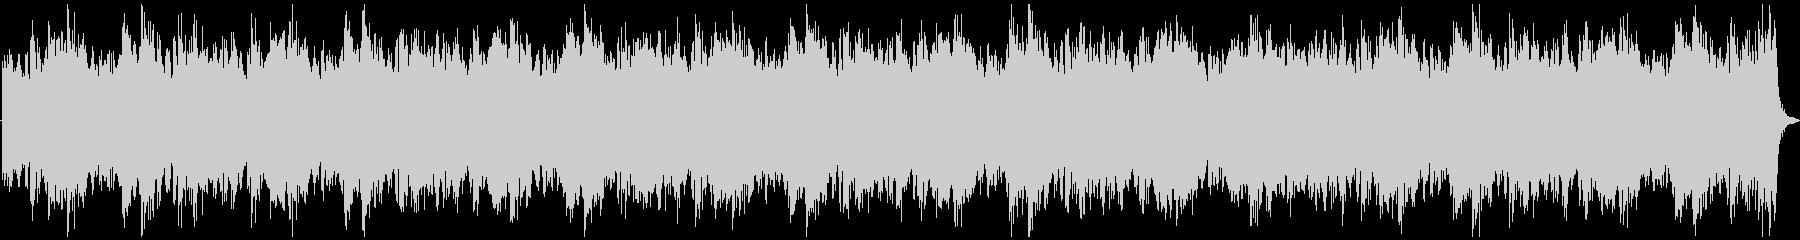 Far, feelings / piano A beautiful impression that sounds fantastically's unreproduced waveform